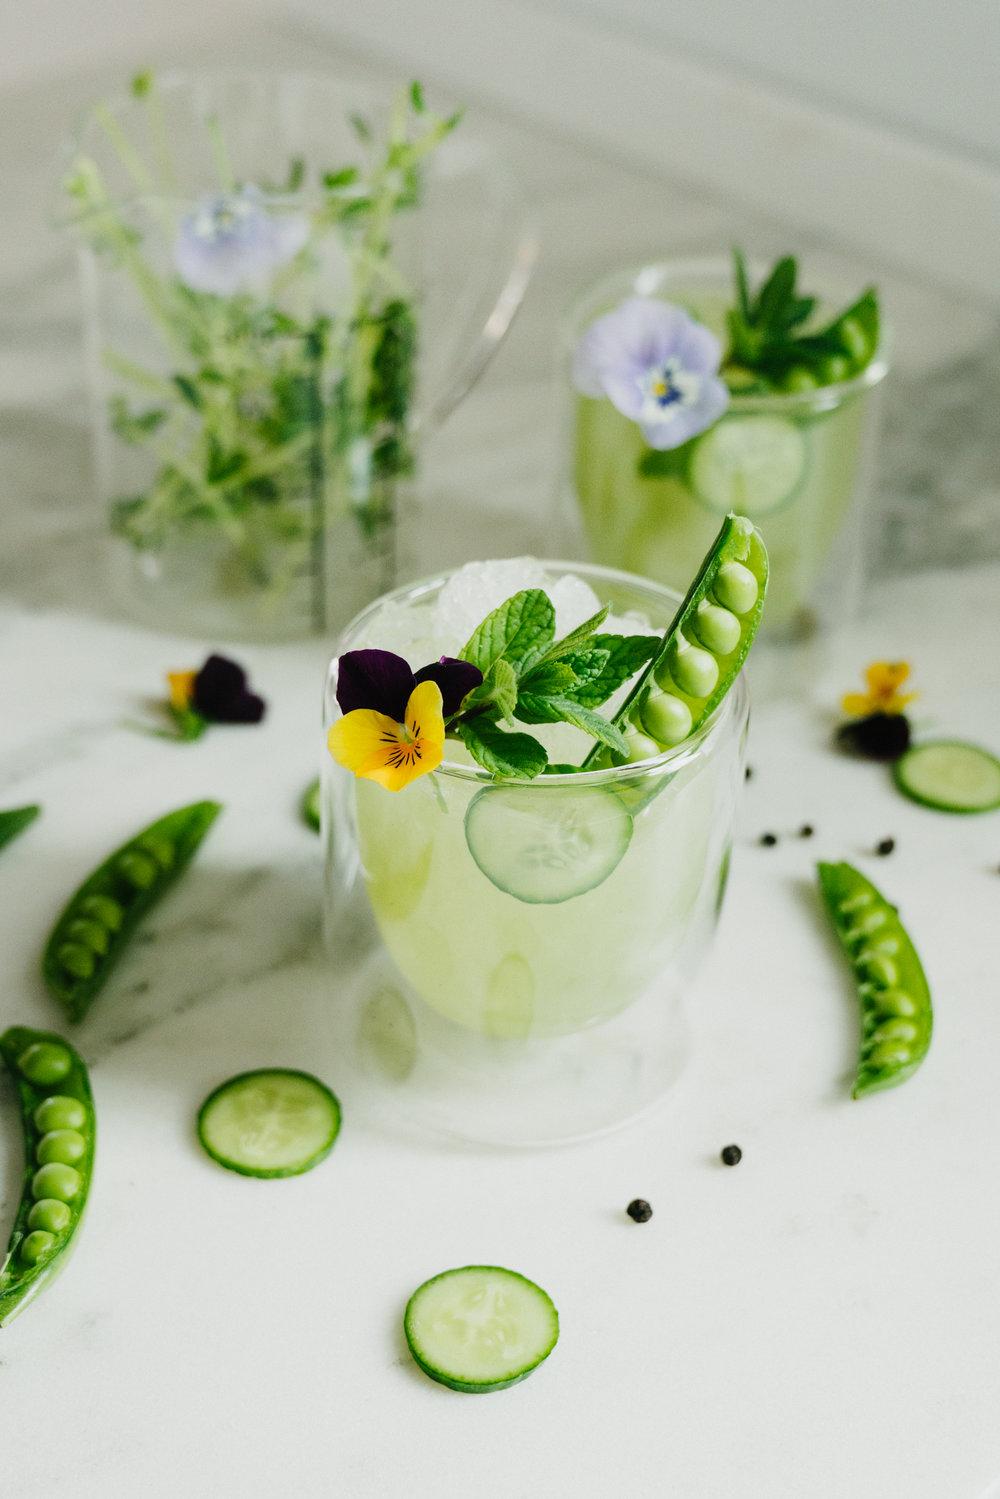 Lemon Herb Spring Garden Margarita -botanical flavors